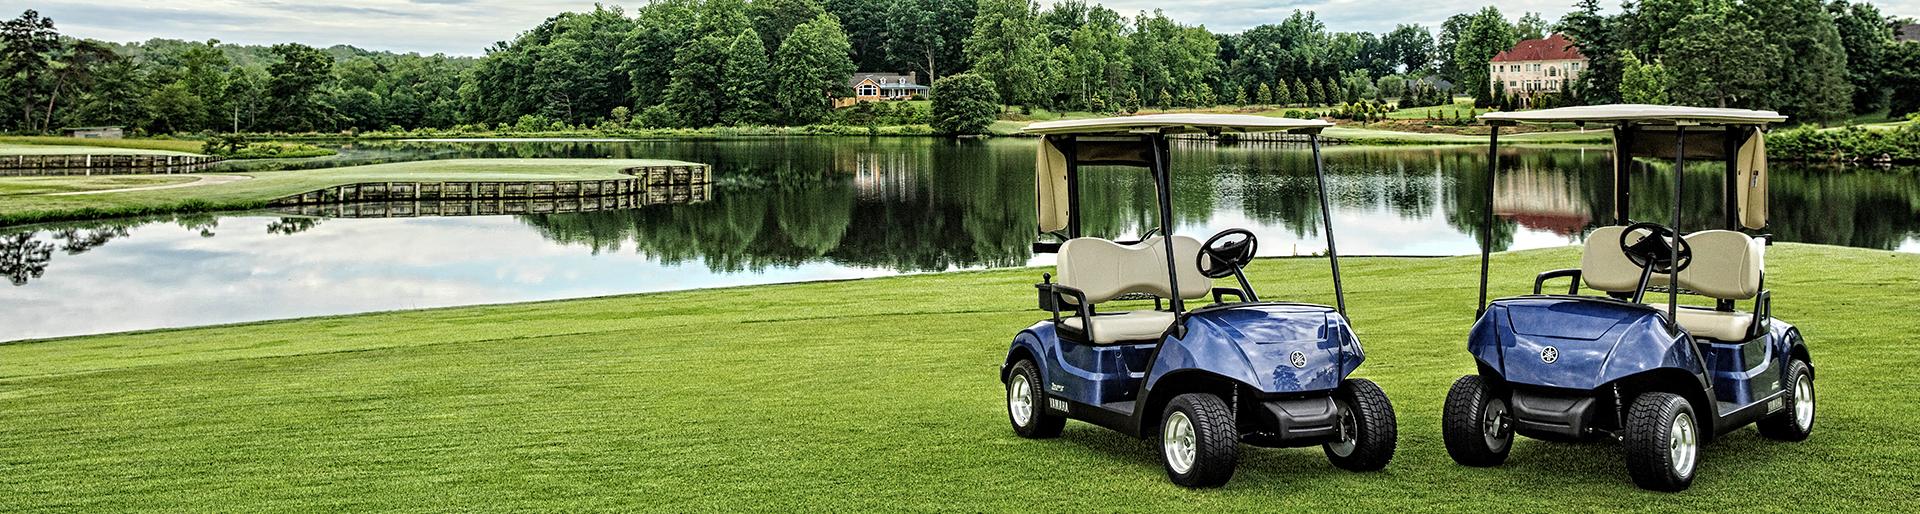 Coastal Carts - Yamaha Golf Carts and Lance Scooters